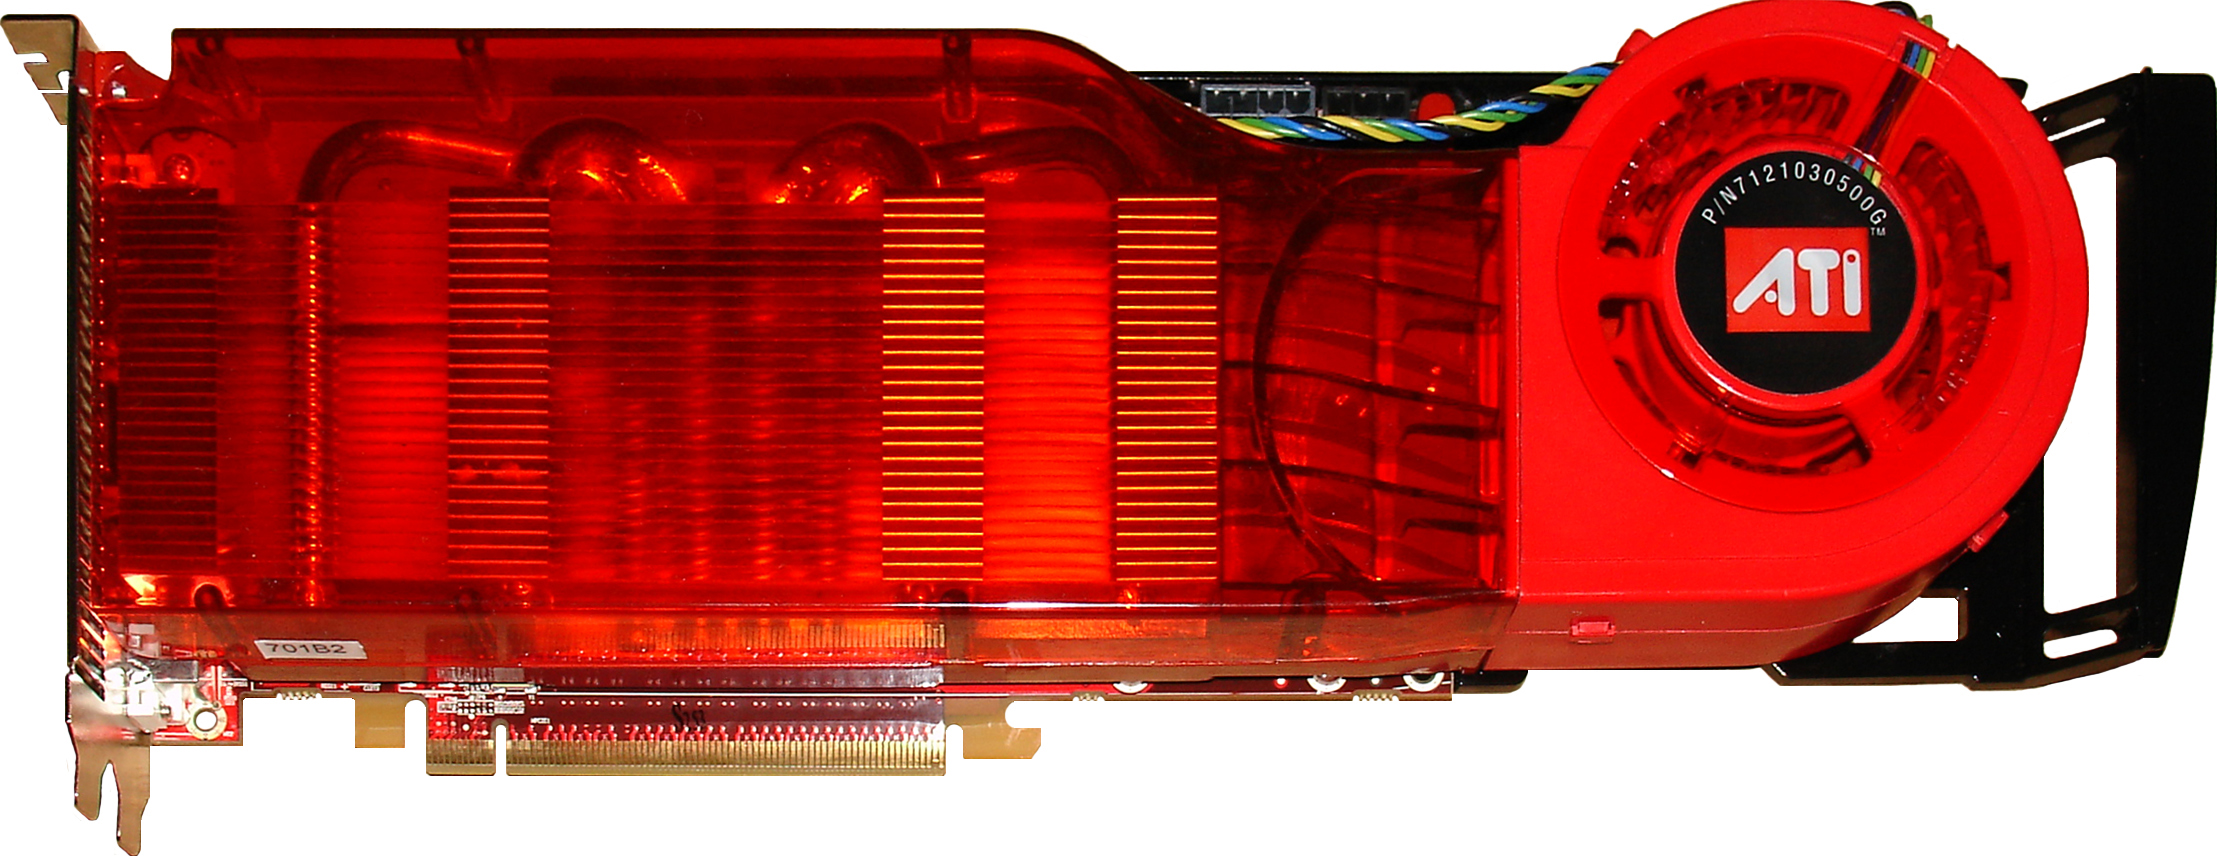 ATi Radeon HD 2900 XTX 1024MB GDDR4 512Bit Rev_A1 0704 Prototype top1.jpg